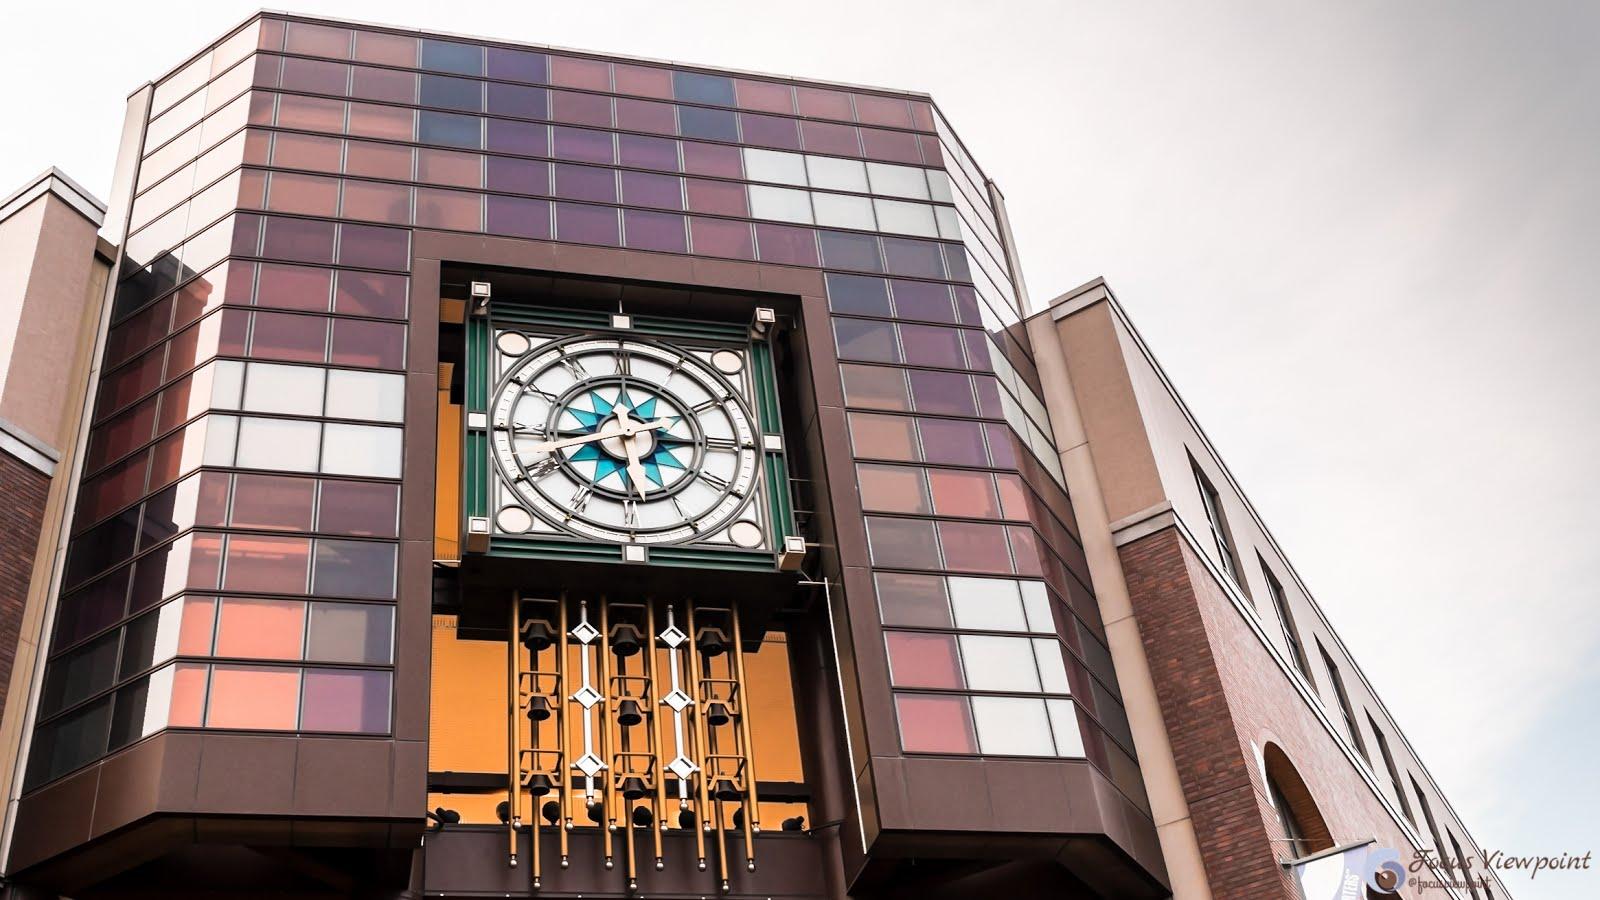 Building Clock are city landmarks at Yokohama World Porters.